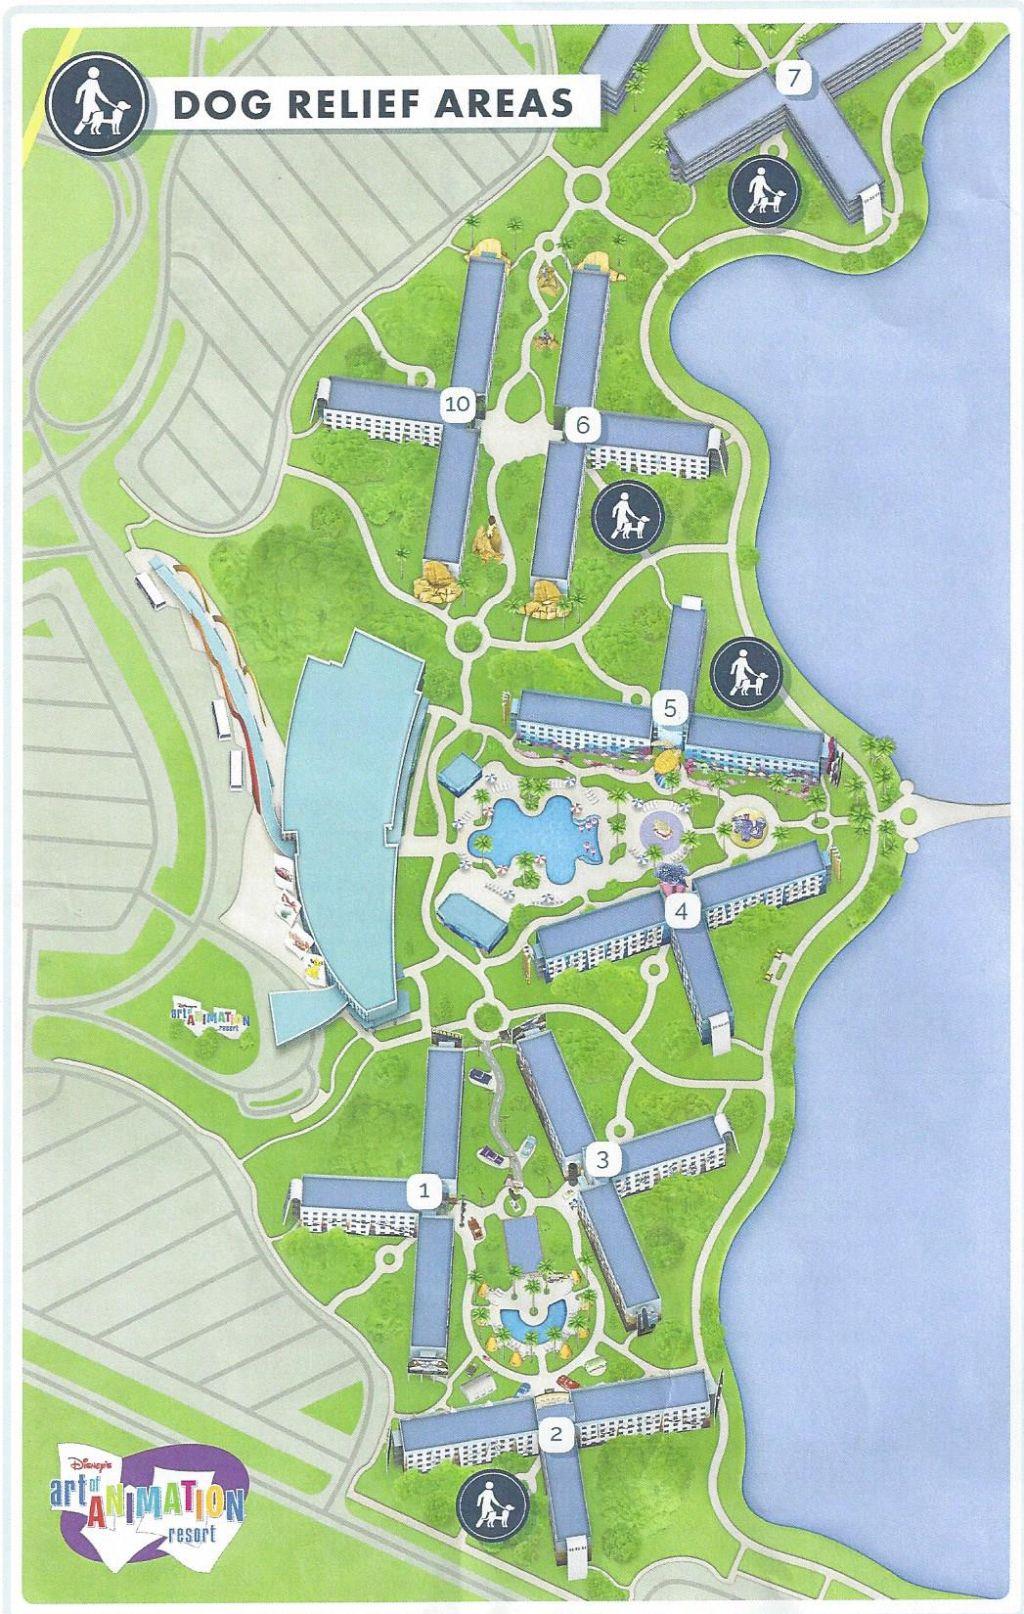 Walt Disney World Map With Hotels.Pet Friendly Hotels At Walt Disney World Resort Allears Net